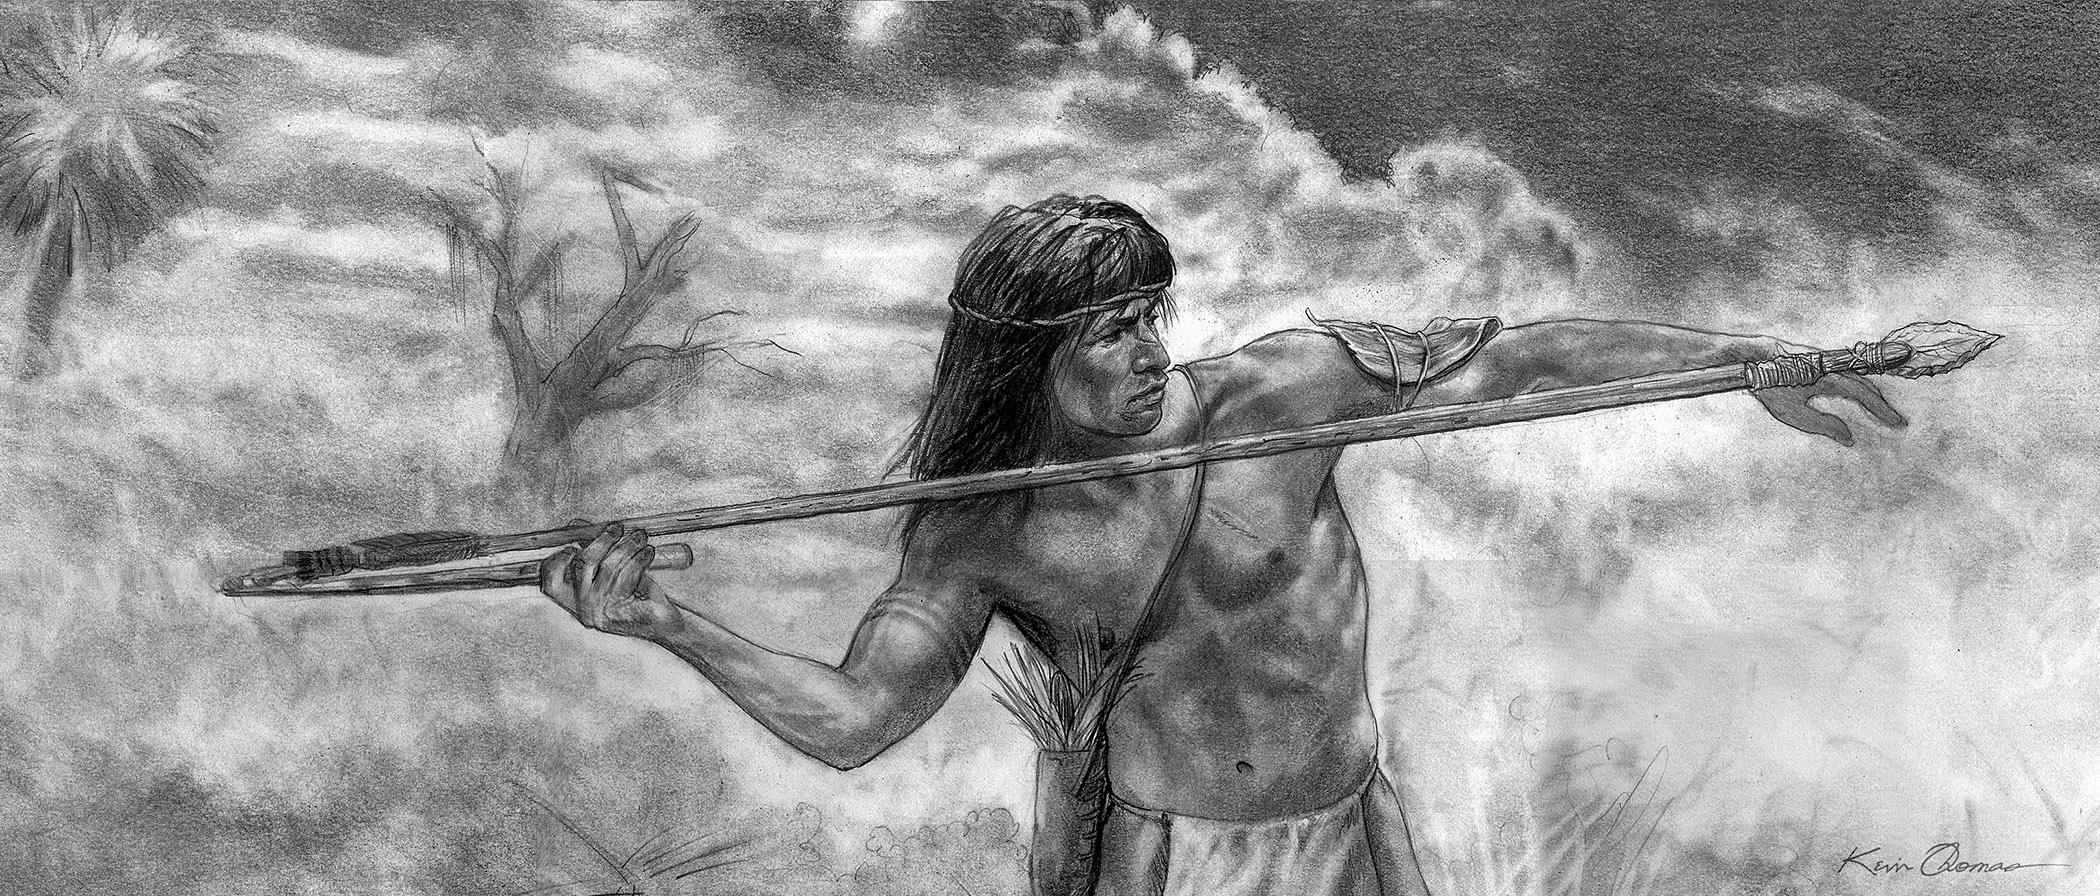 """Seminole hunter gatherer launches spear with atlatl"" • 10"" x 30"" • Graphite, South Florida Museum, Bradenton, FL. © KT"